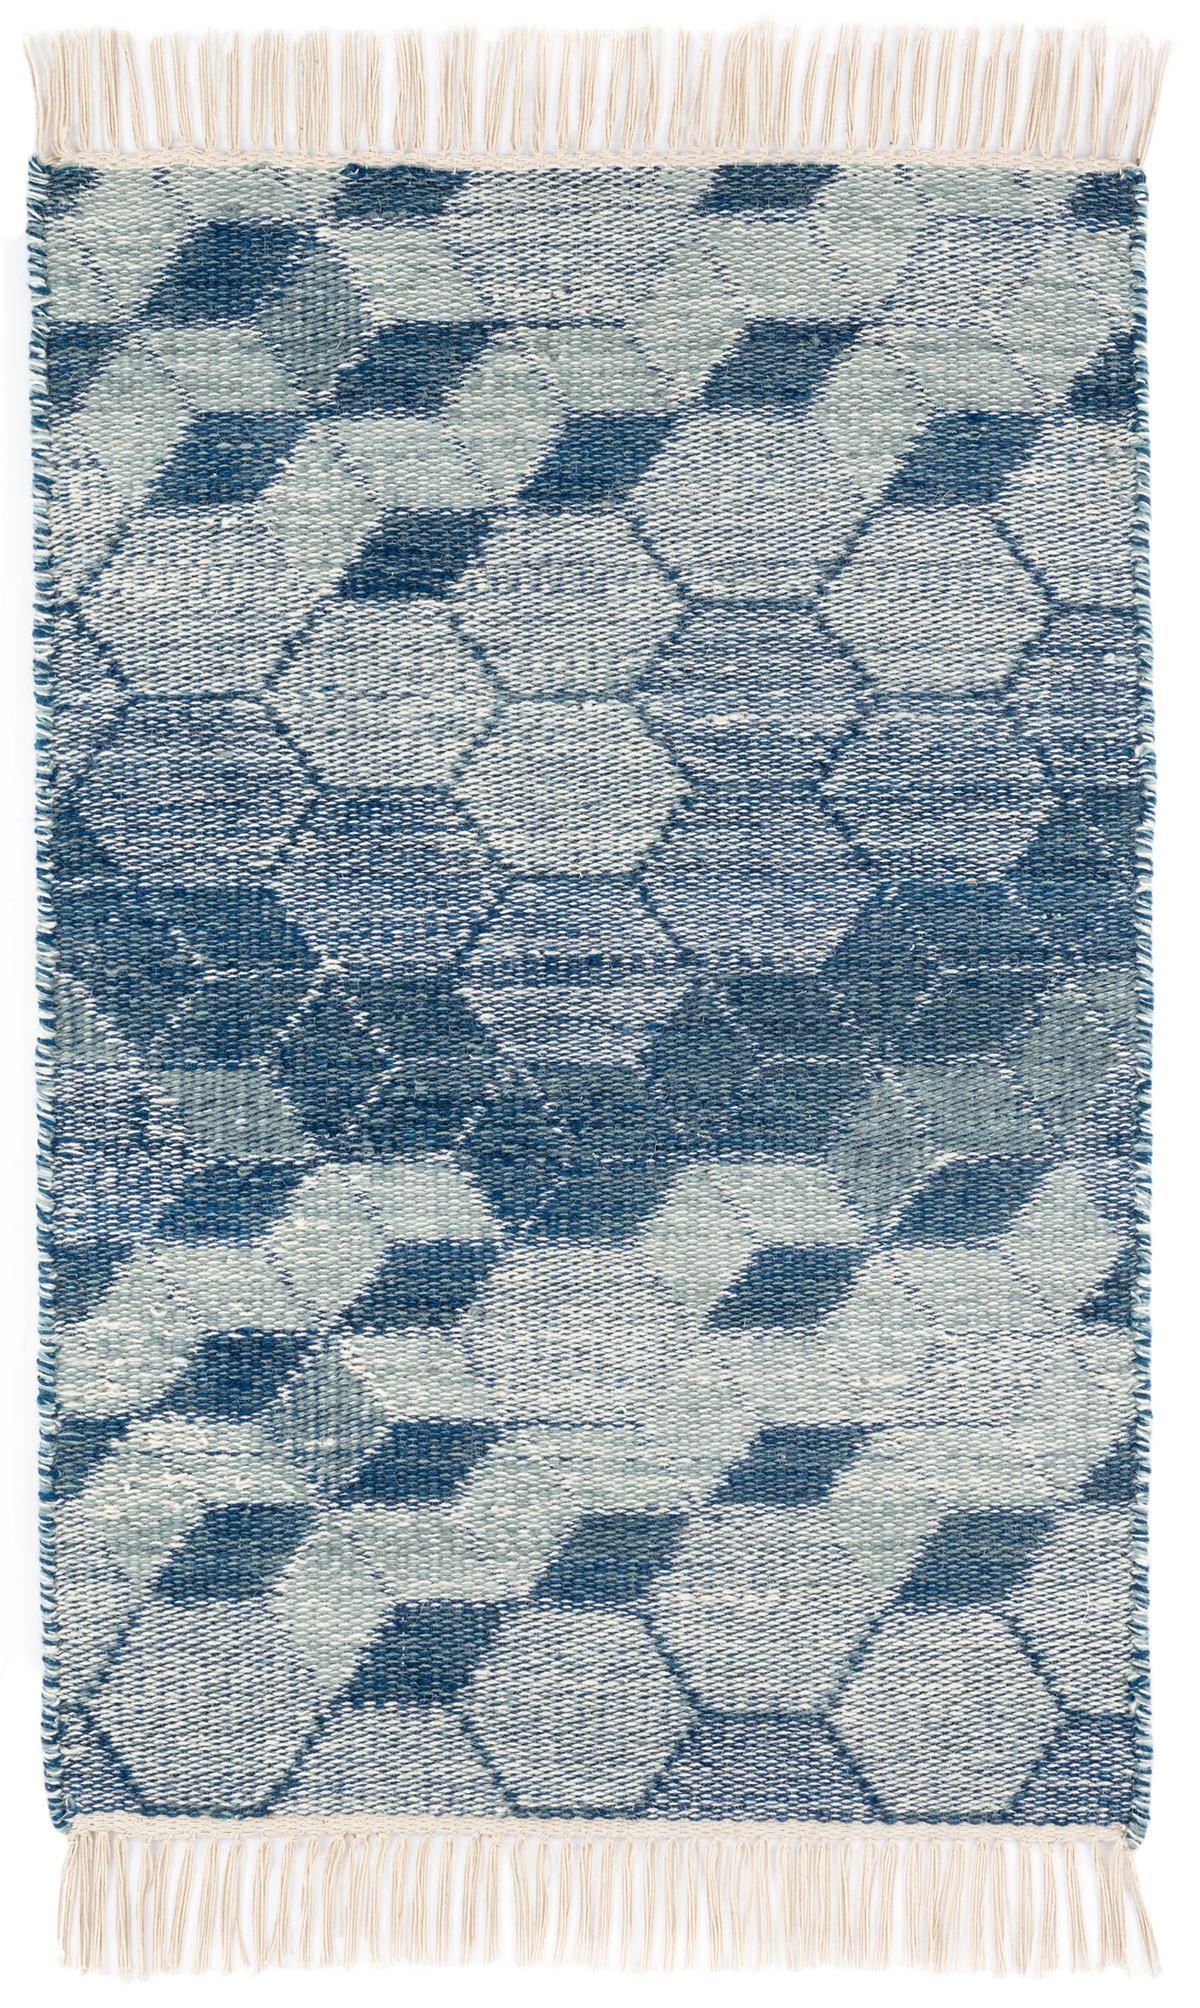 Odyssey Blue Woven Wool Rug